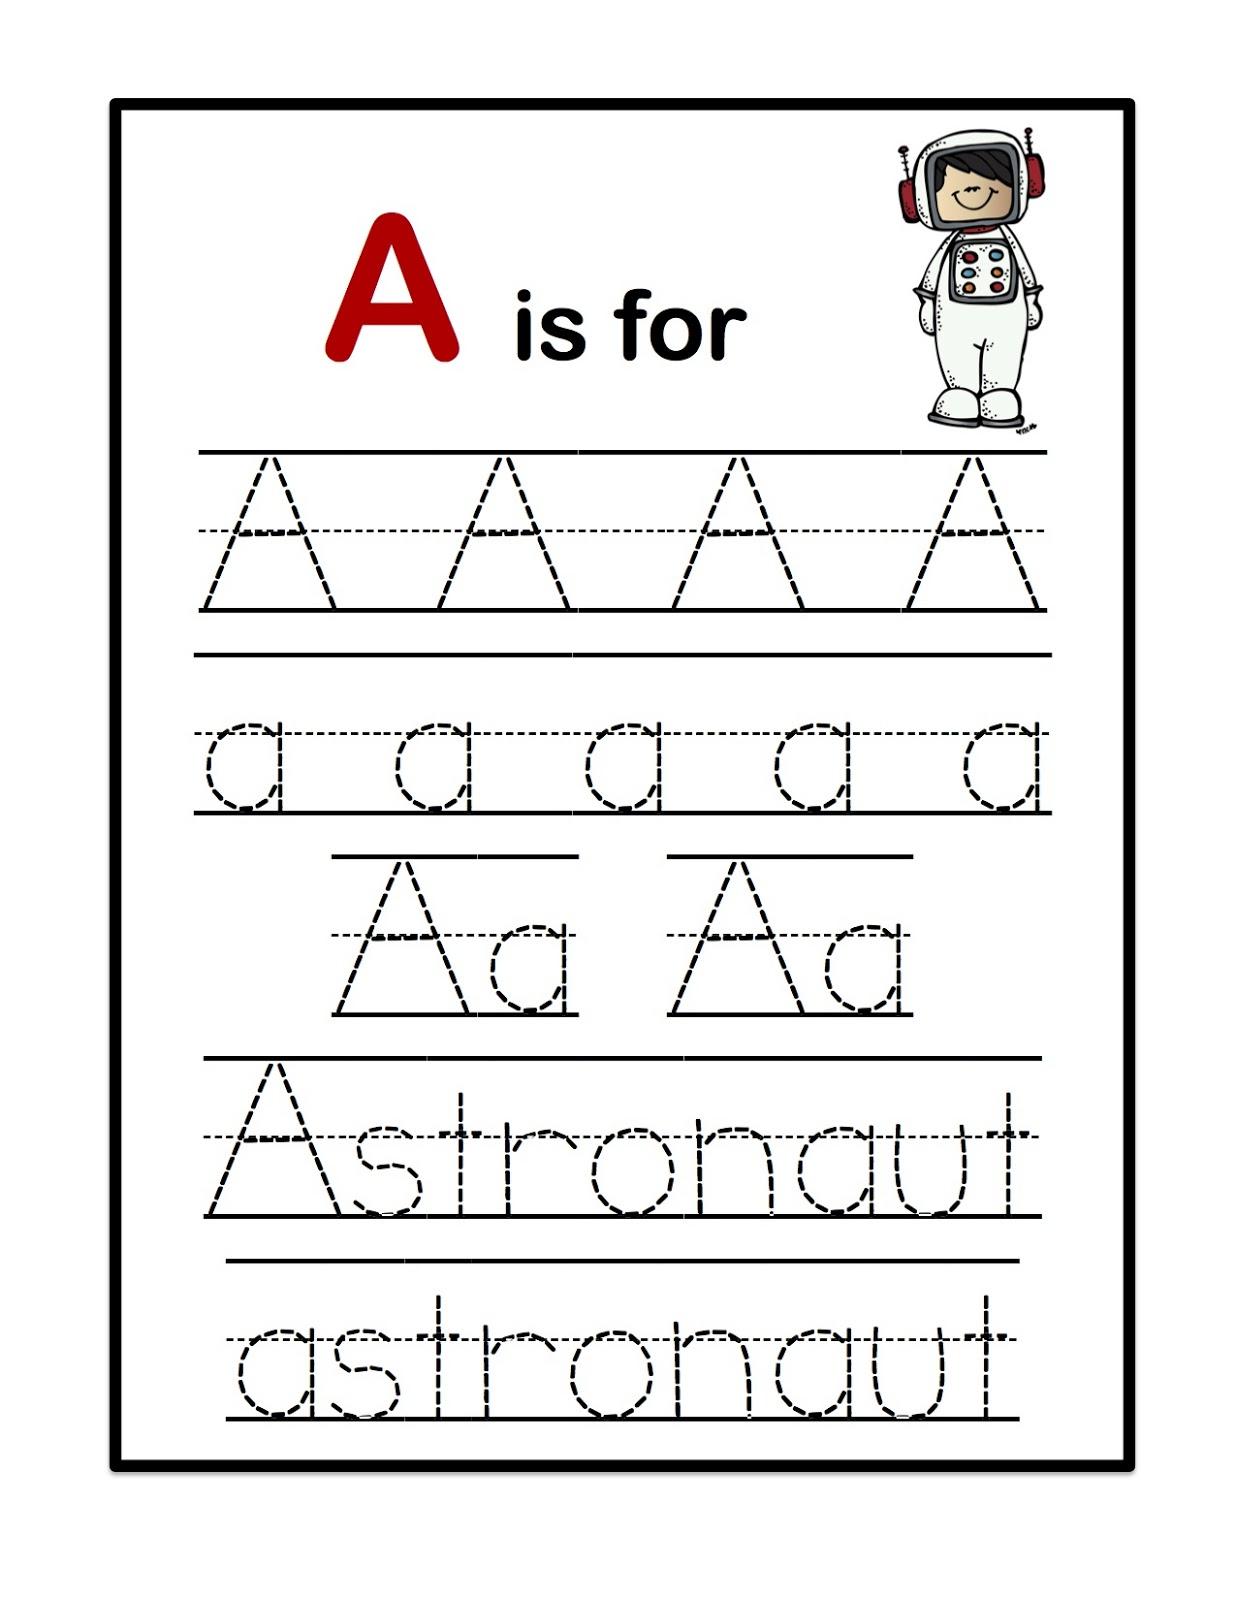 Astronaut Worksheet Free Printable